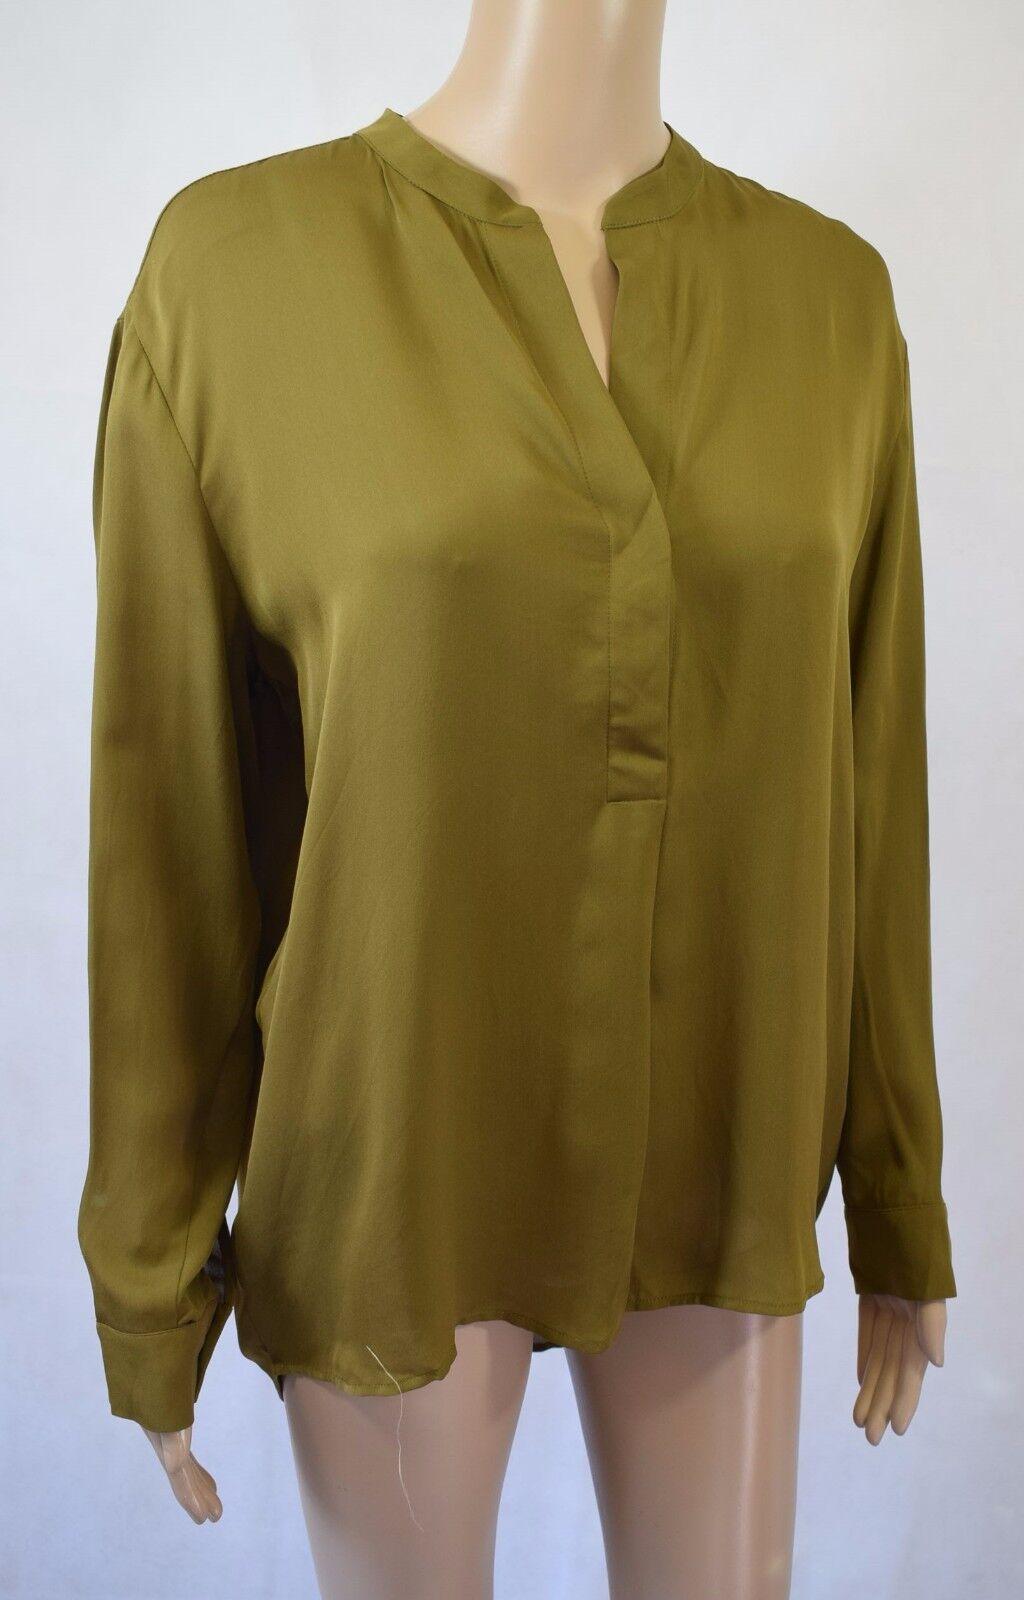 BNWT Samsoe & Samsoe Silk Waddi Shirt In Fir Grün - Größe M - RRP   (R103)